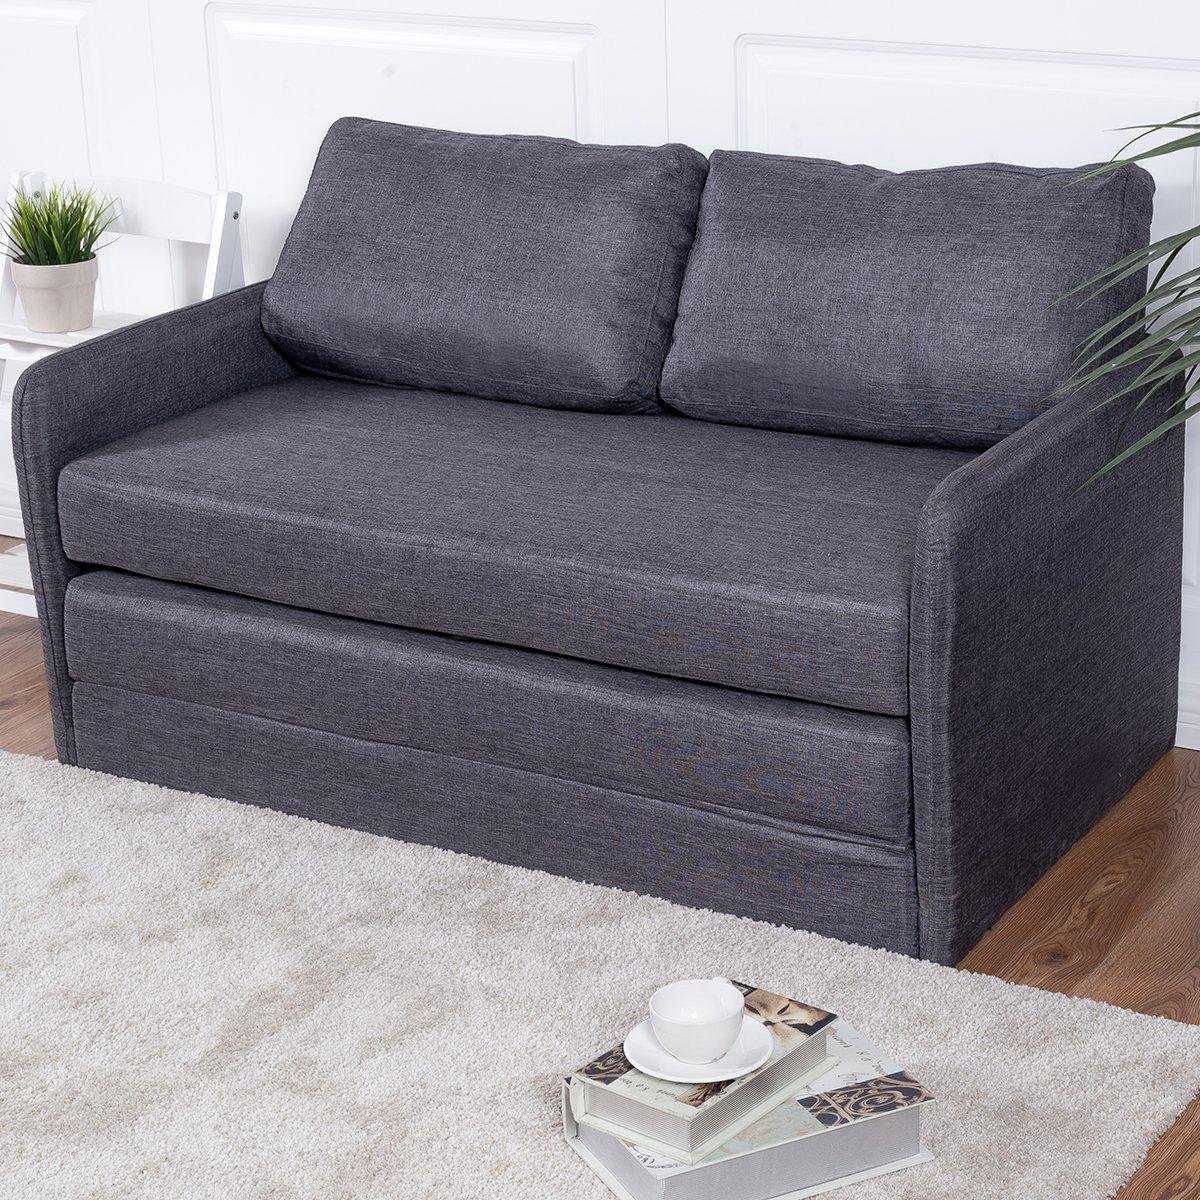 Amazon Giantex Foldable Sleeper Sofa Bed Couch Loveseat